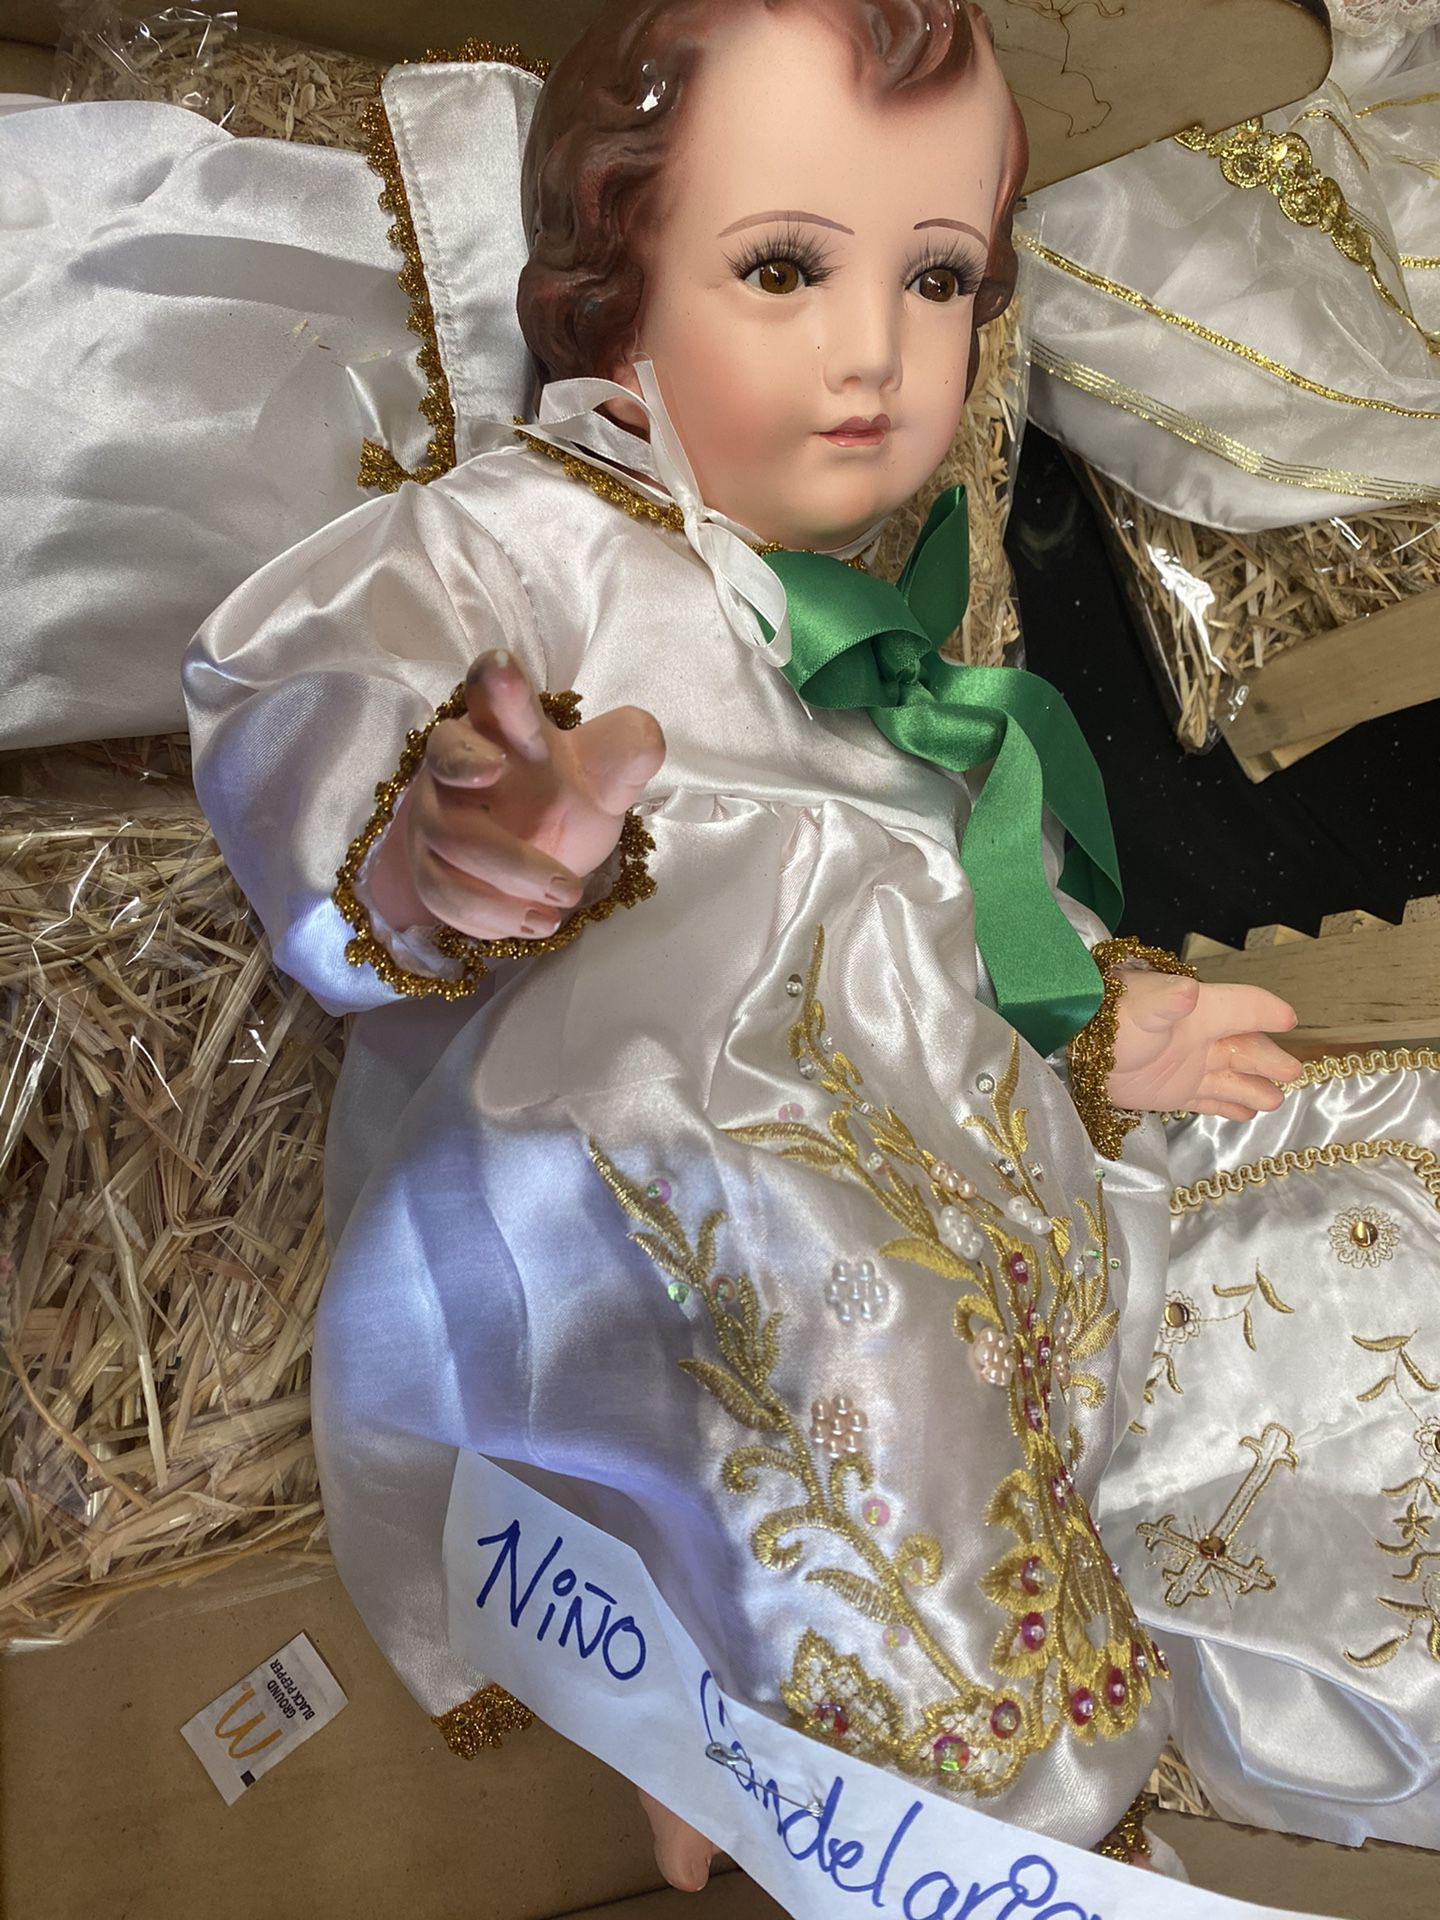 Nino Dios